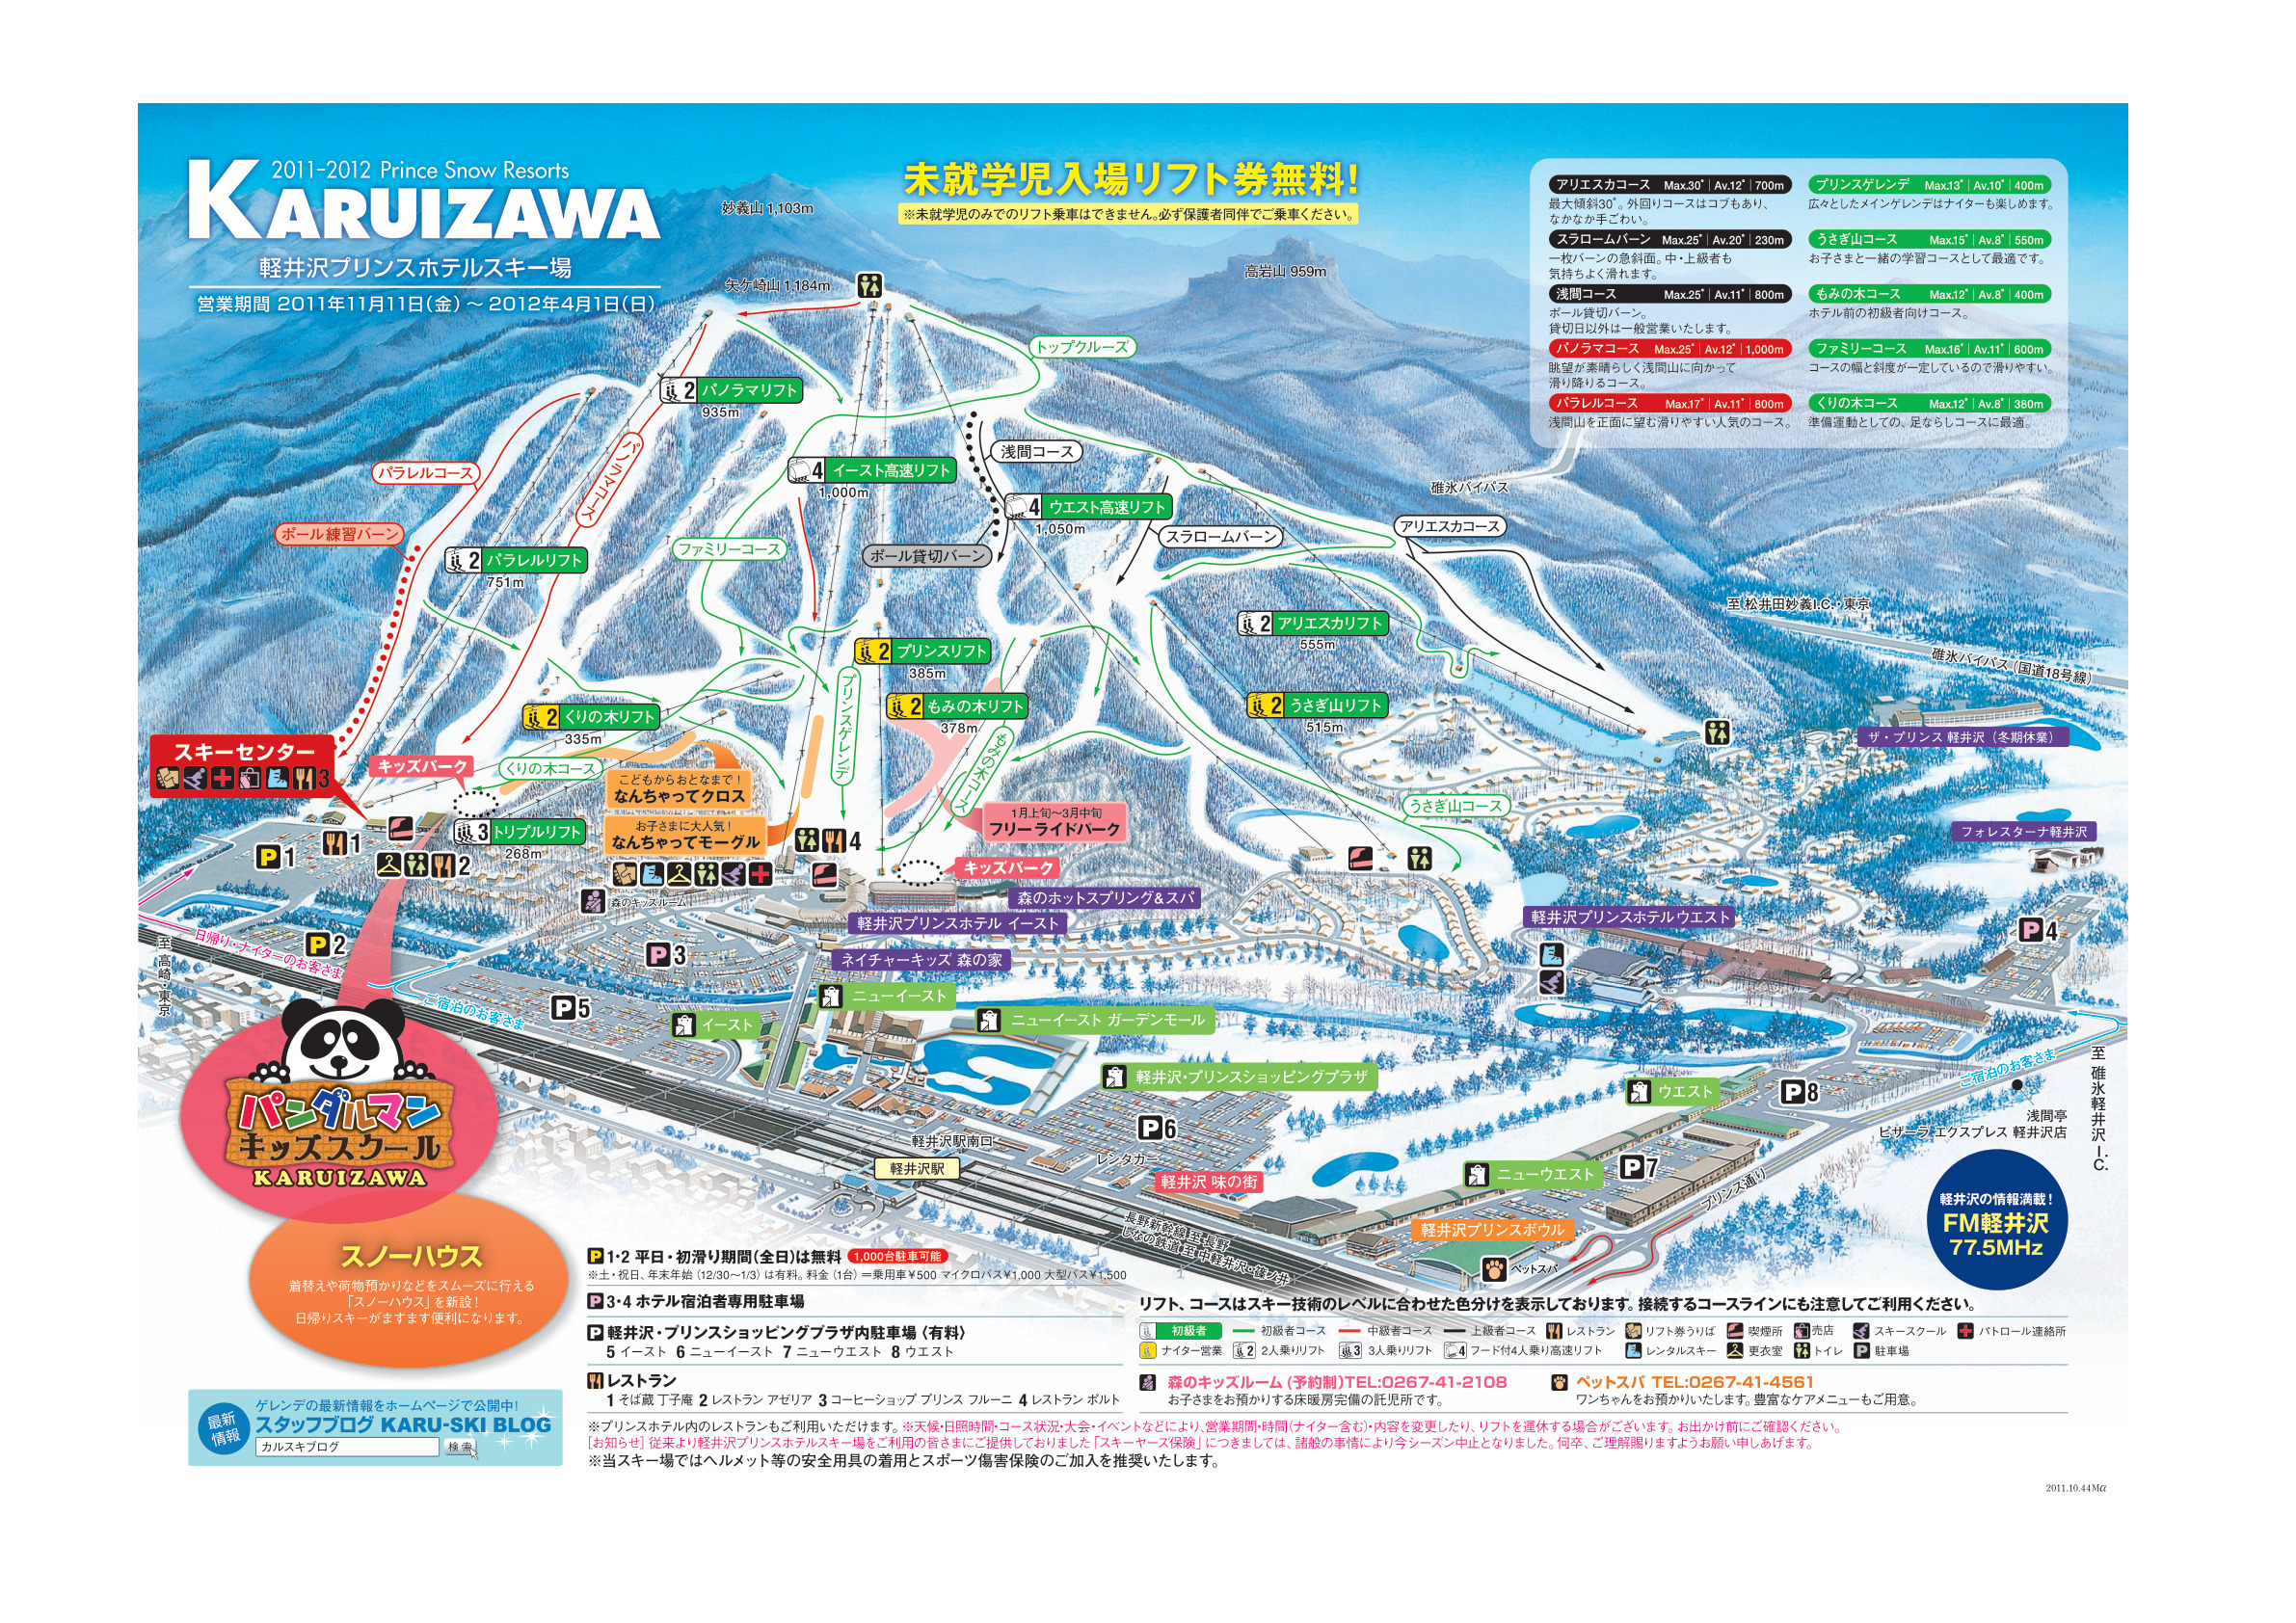 Karuizawa Prince Hotel Piste / Trail Map